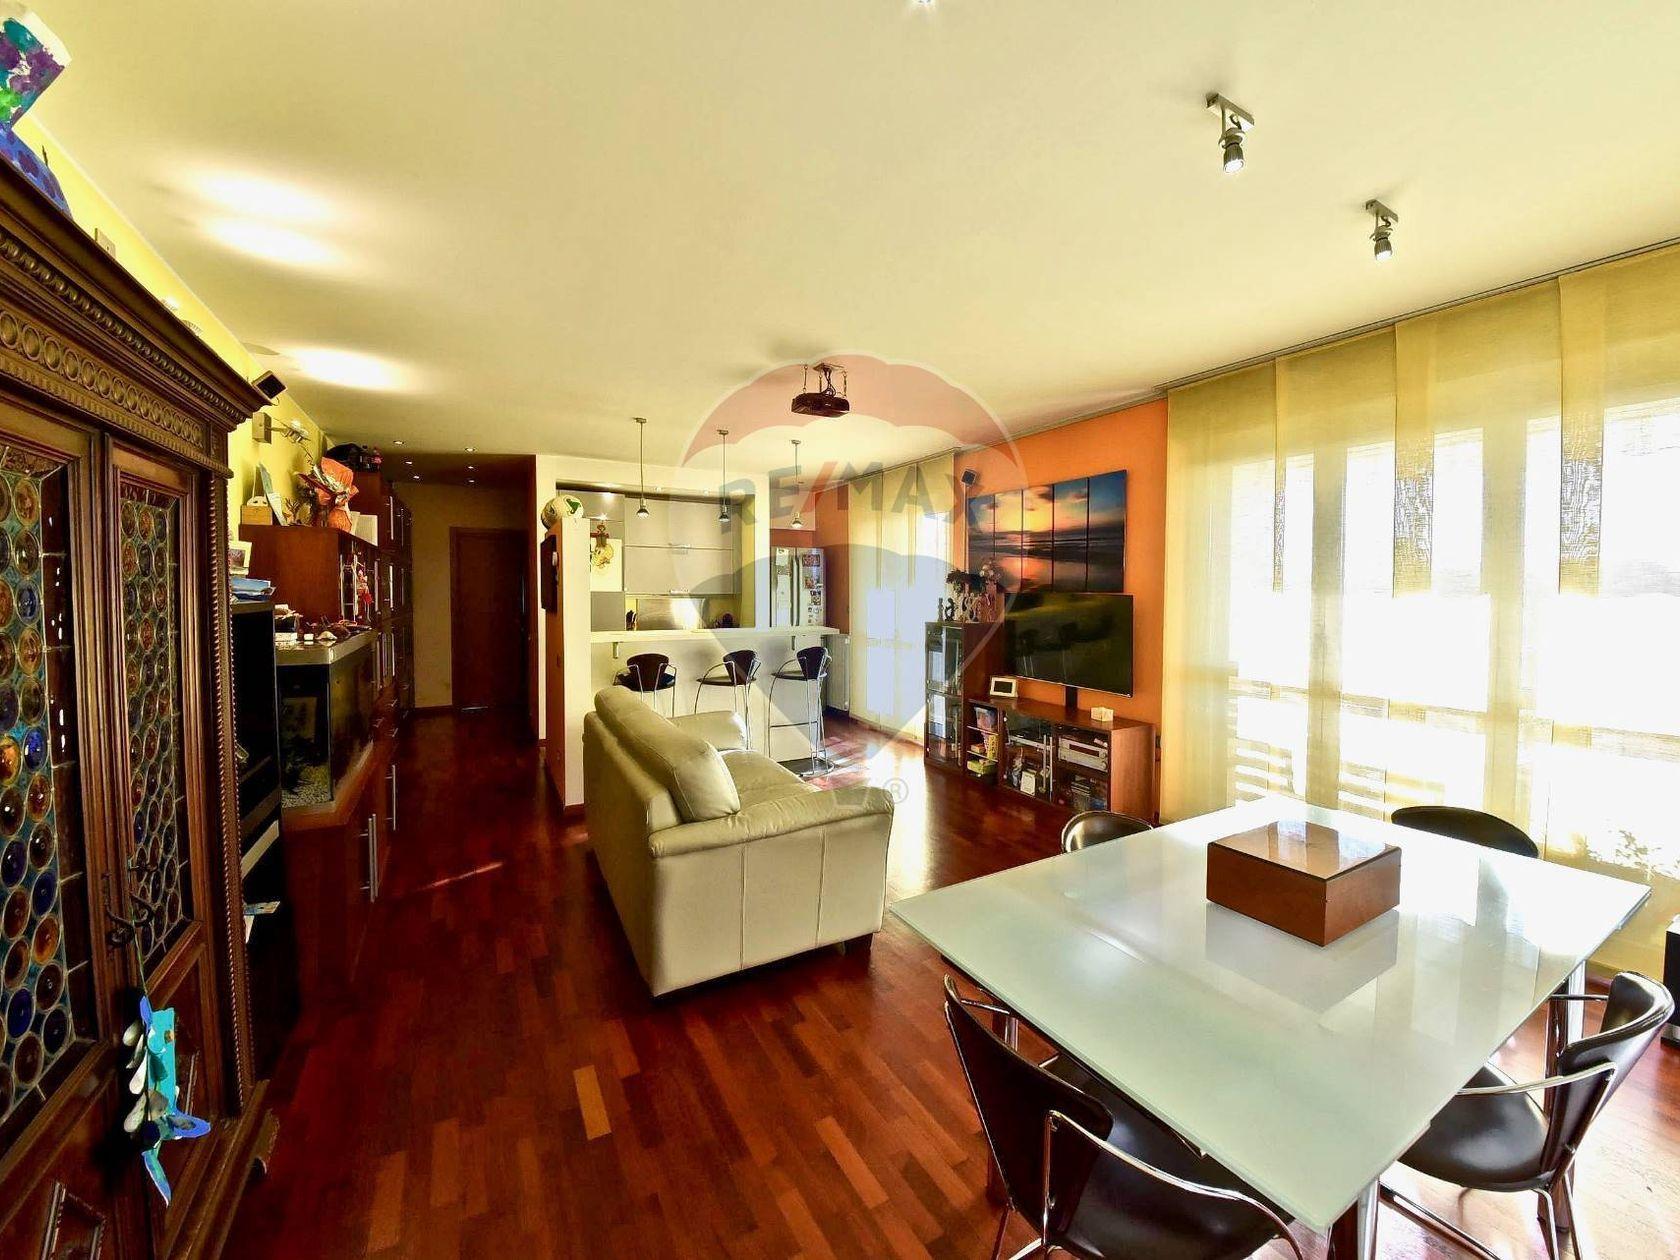 Appartamento Cascina ferrara, Saronno, VA Vendita - Foto 5